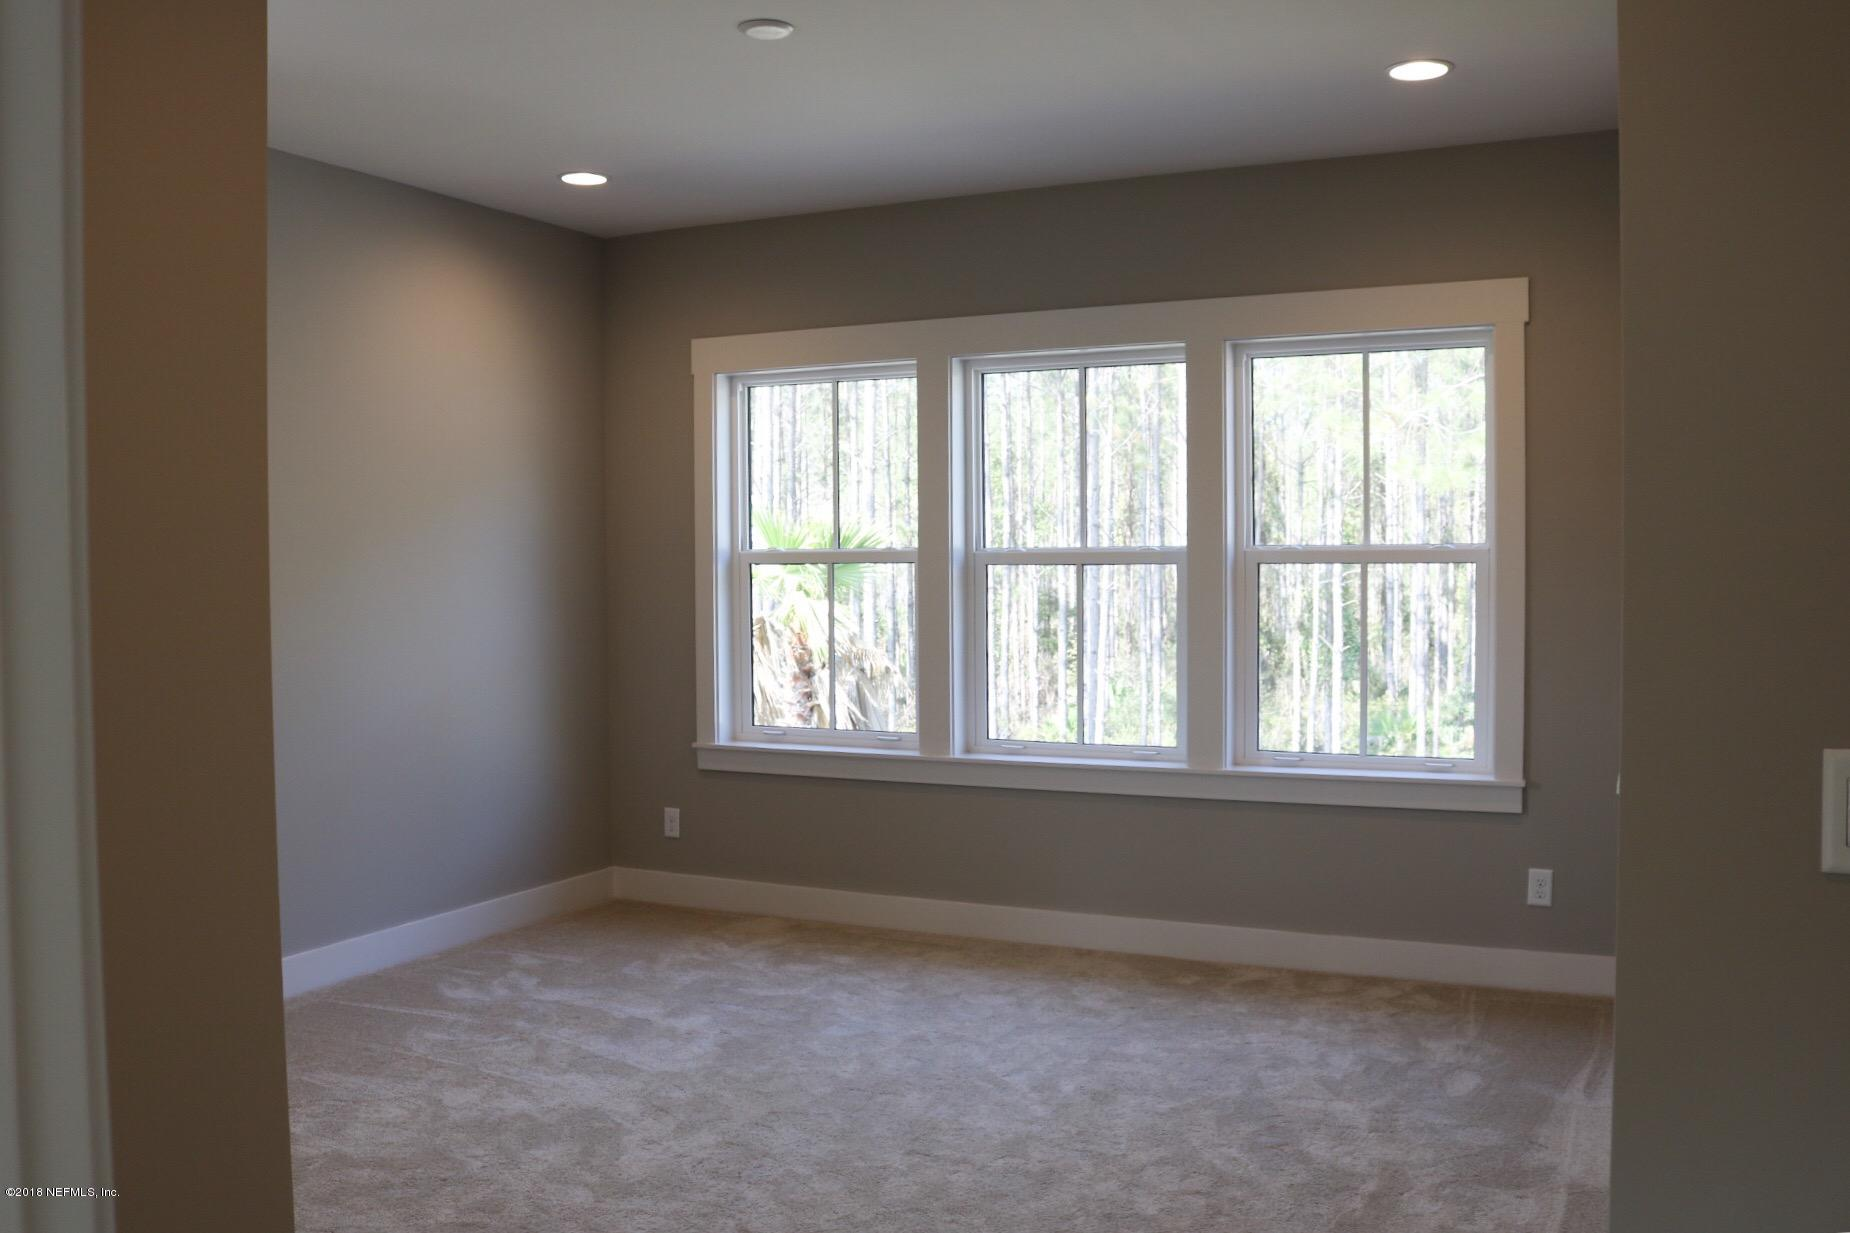 118 OAK CREEK, PONTE VEDRA, FLORIDA 32081, 5 Bedrooms Bedrooms, ,5 BathroomsBathrooms,Residential - single family,For sale,OAK CREEK,923353